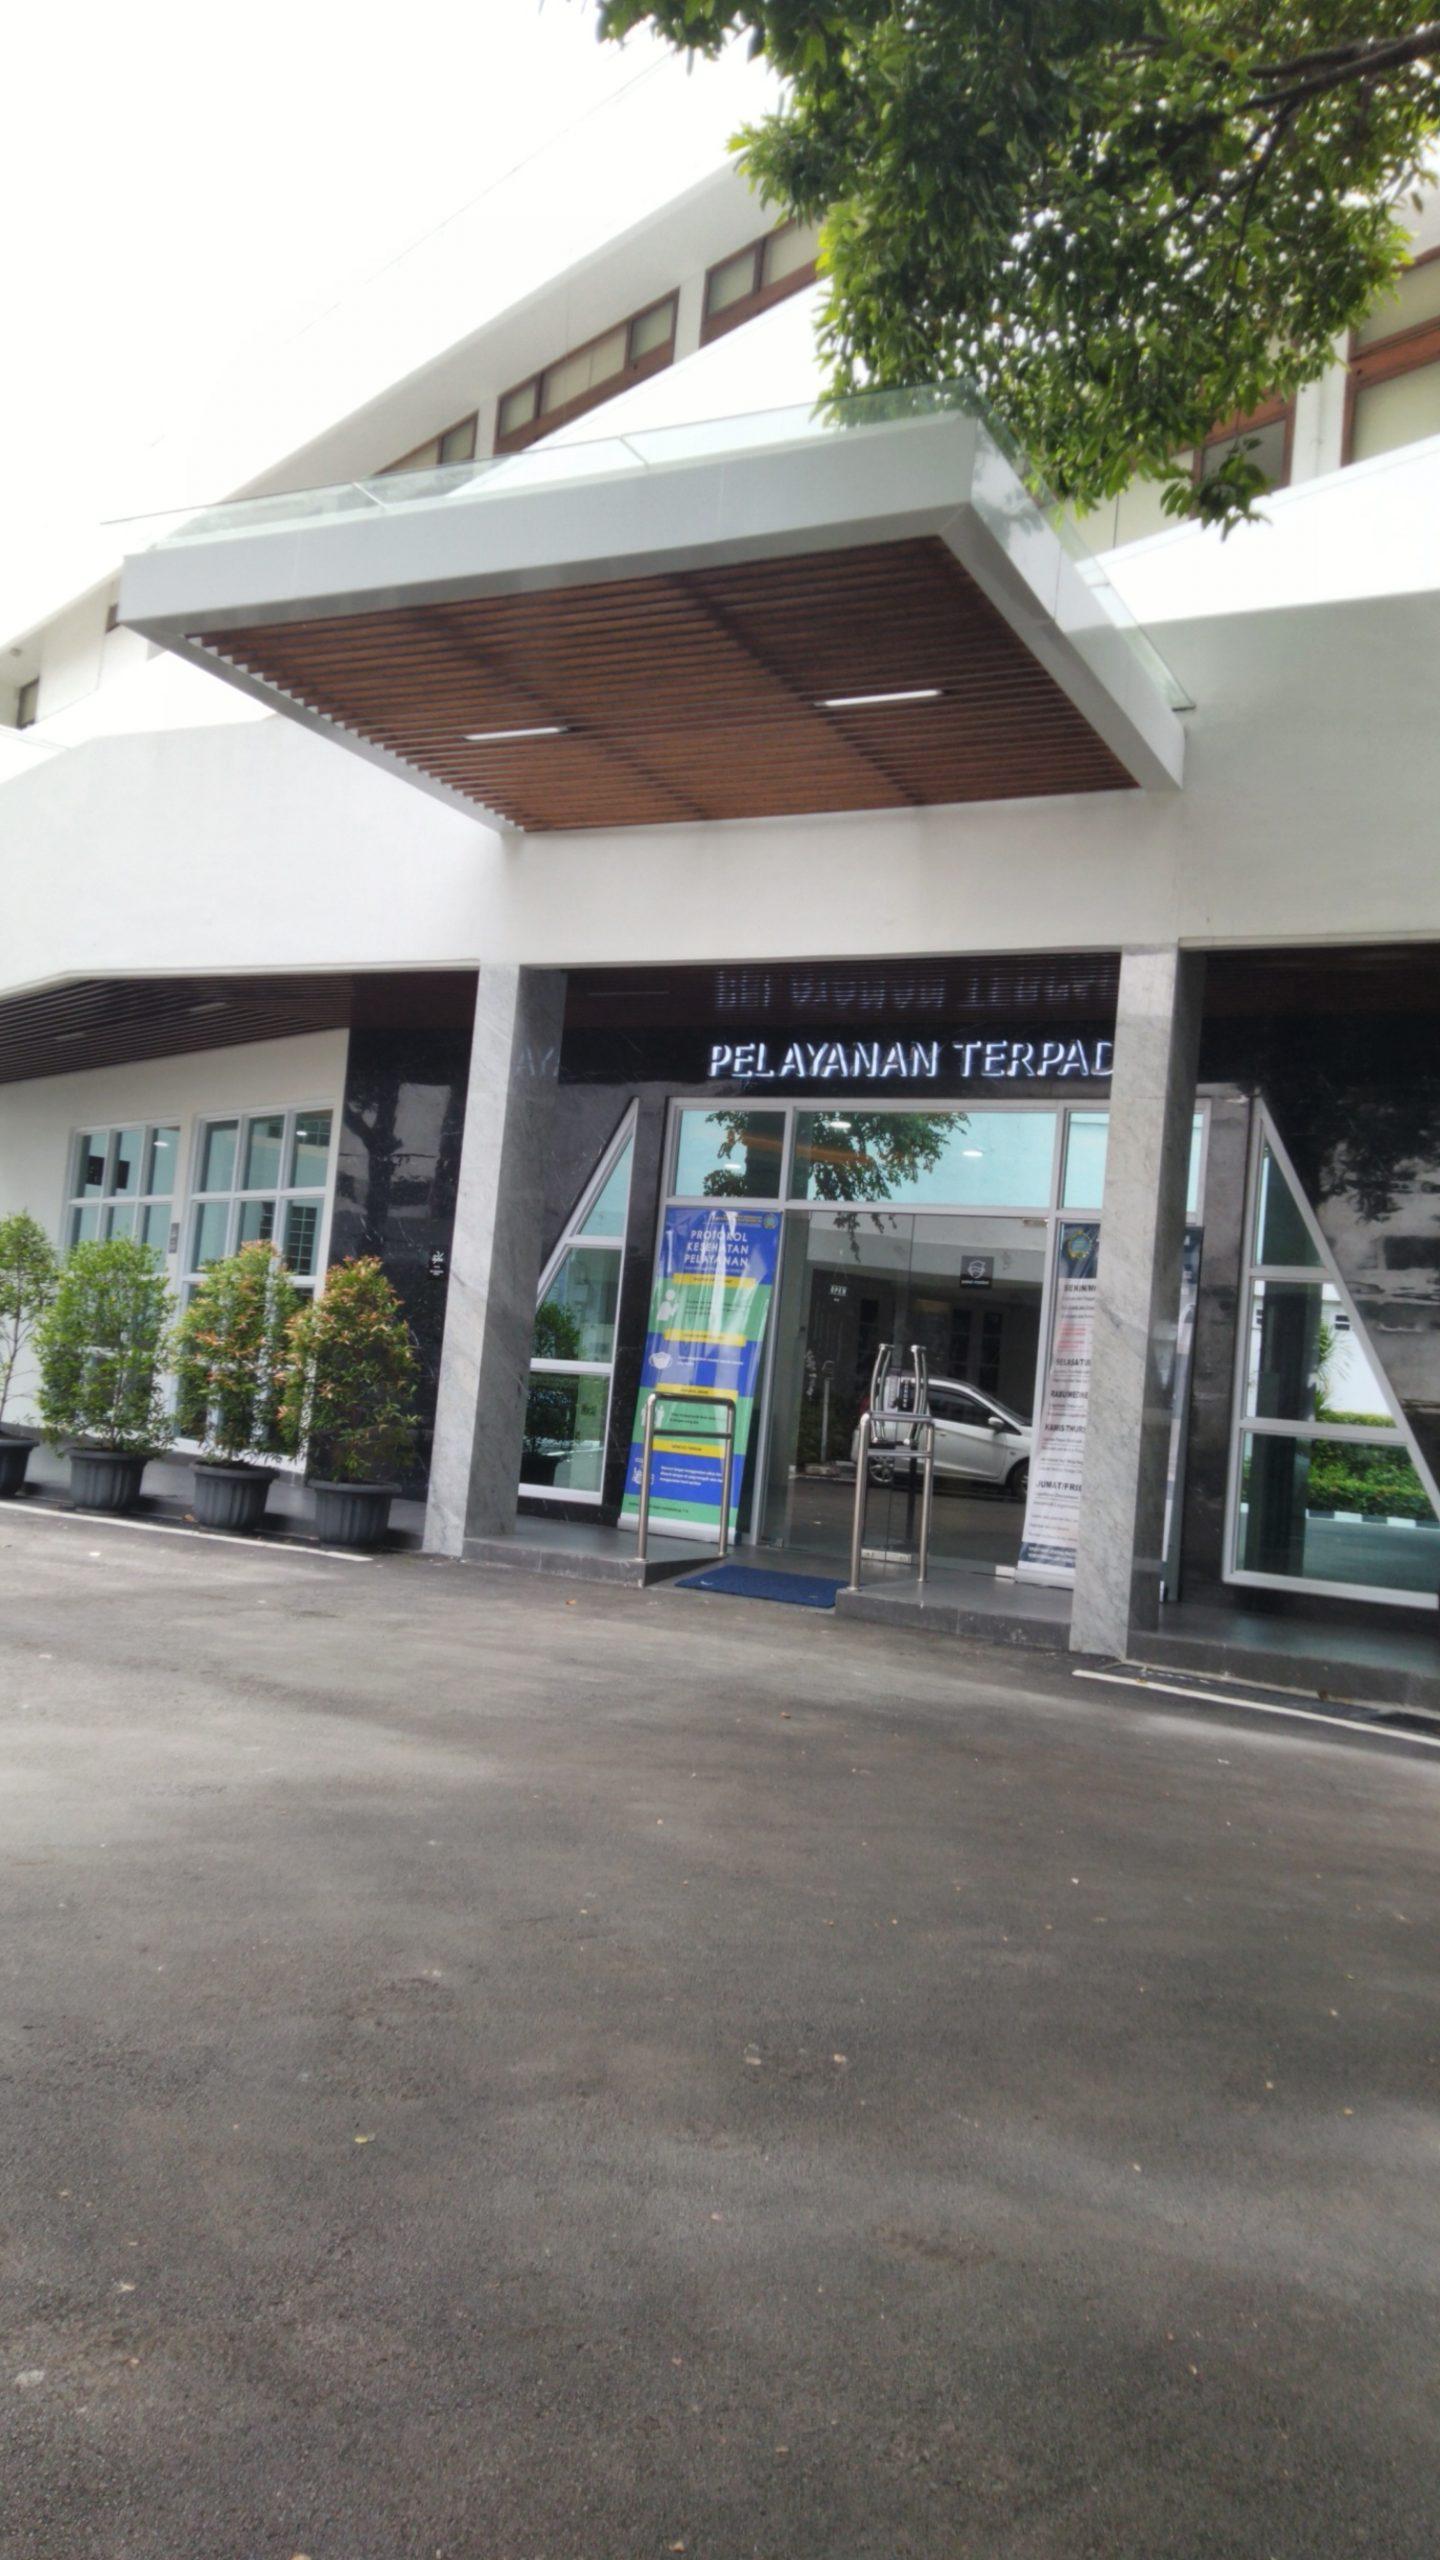 Kemana Harus Legalisasi Dokumen untuk Keperluan di Indonesia ?